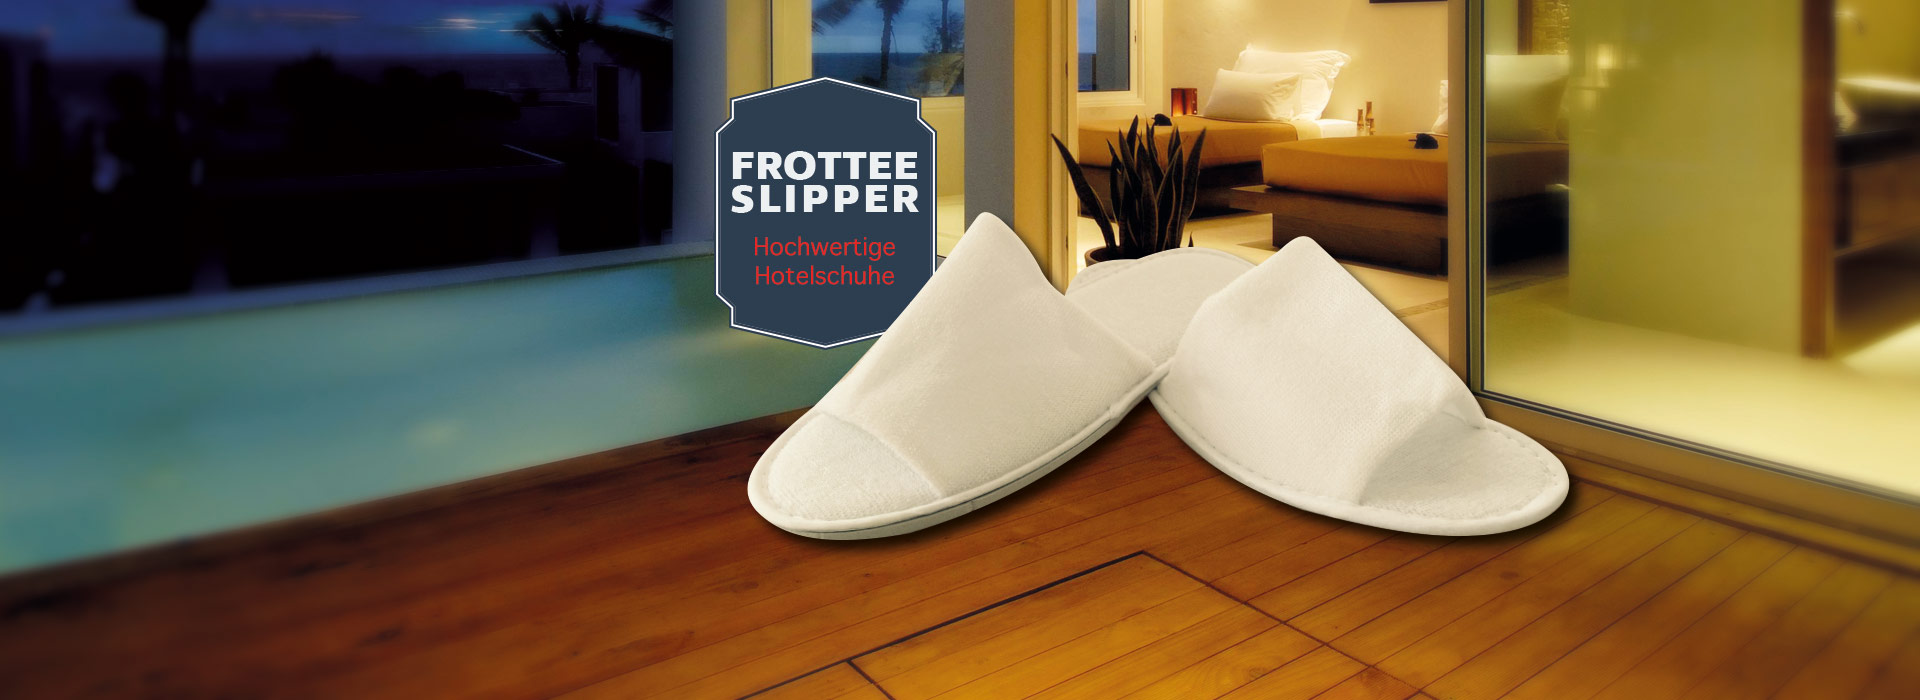 Teaser Frottee Slipper